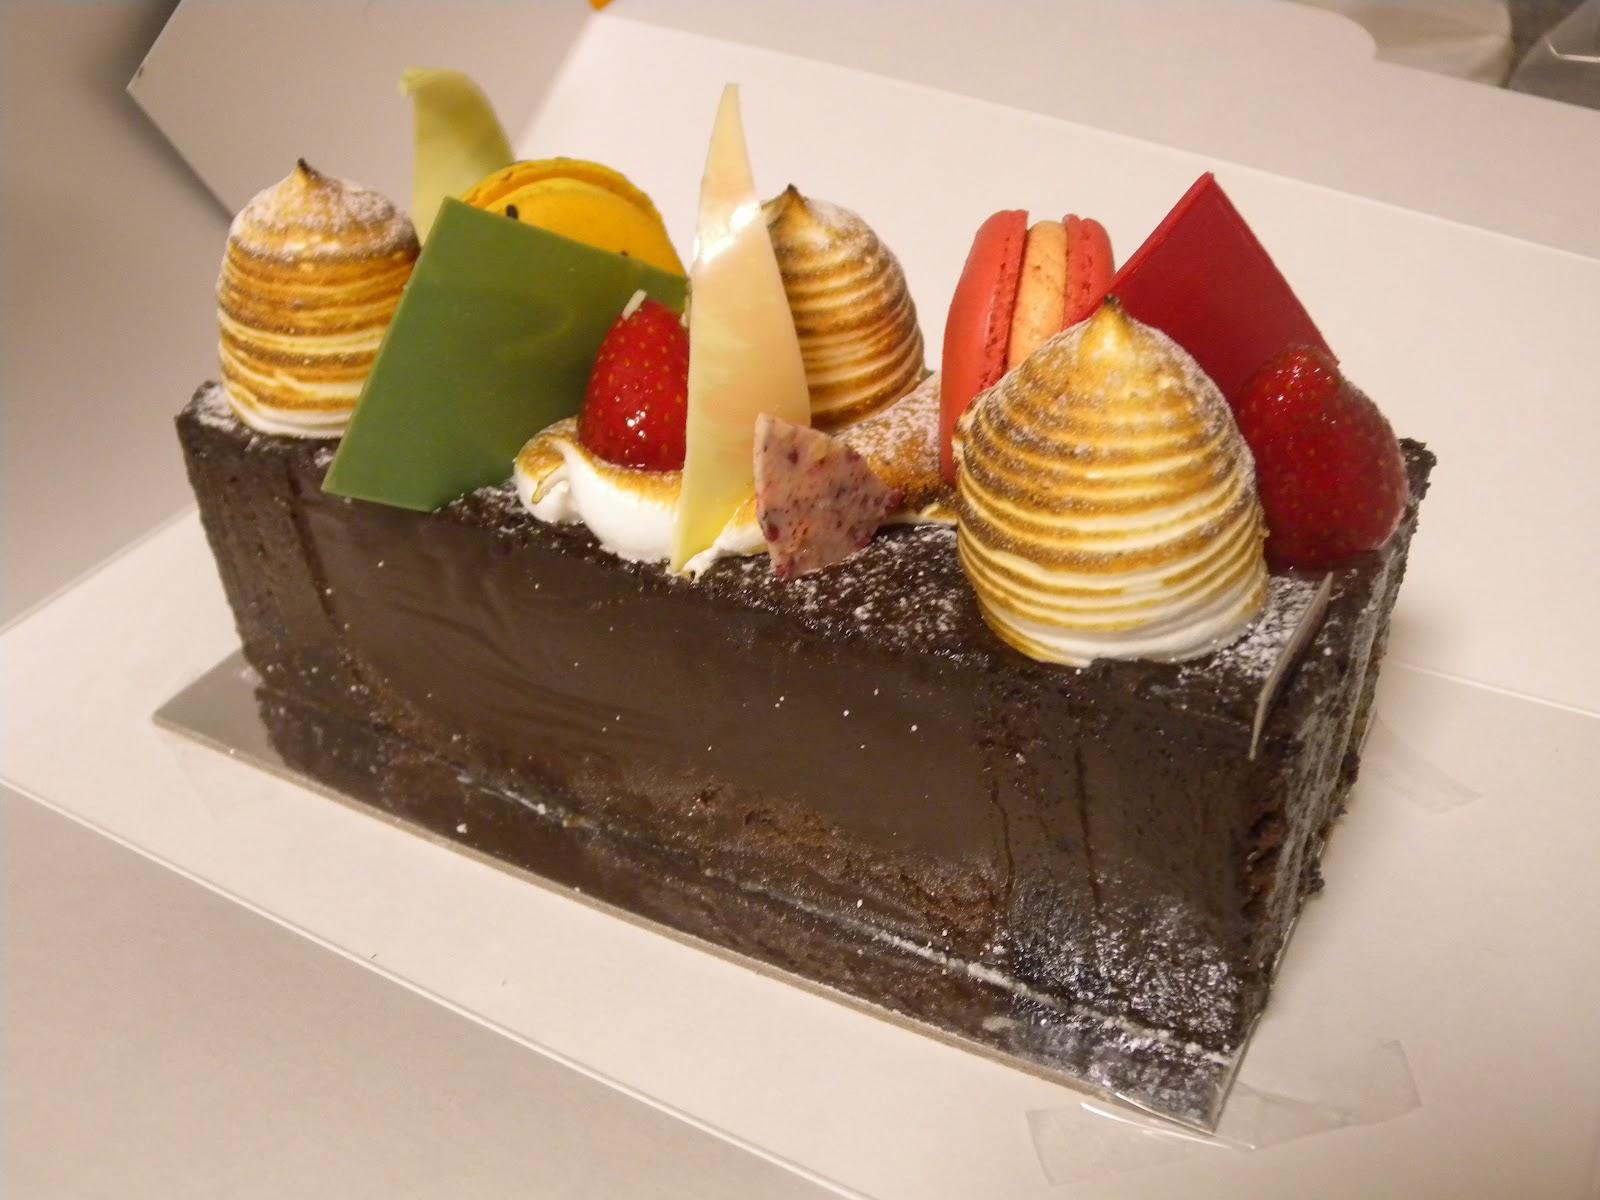 Birthday Cakes Zumbo ~ Food.loves.my.mouth.: adriano zumbo pâtissier